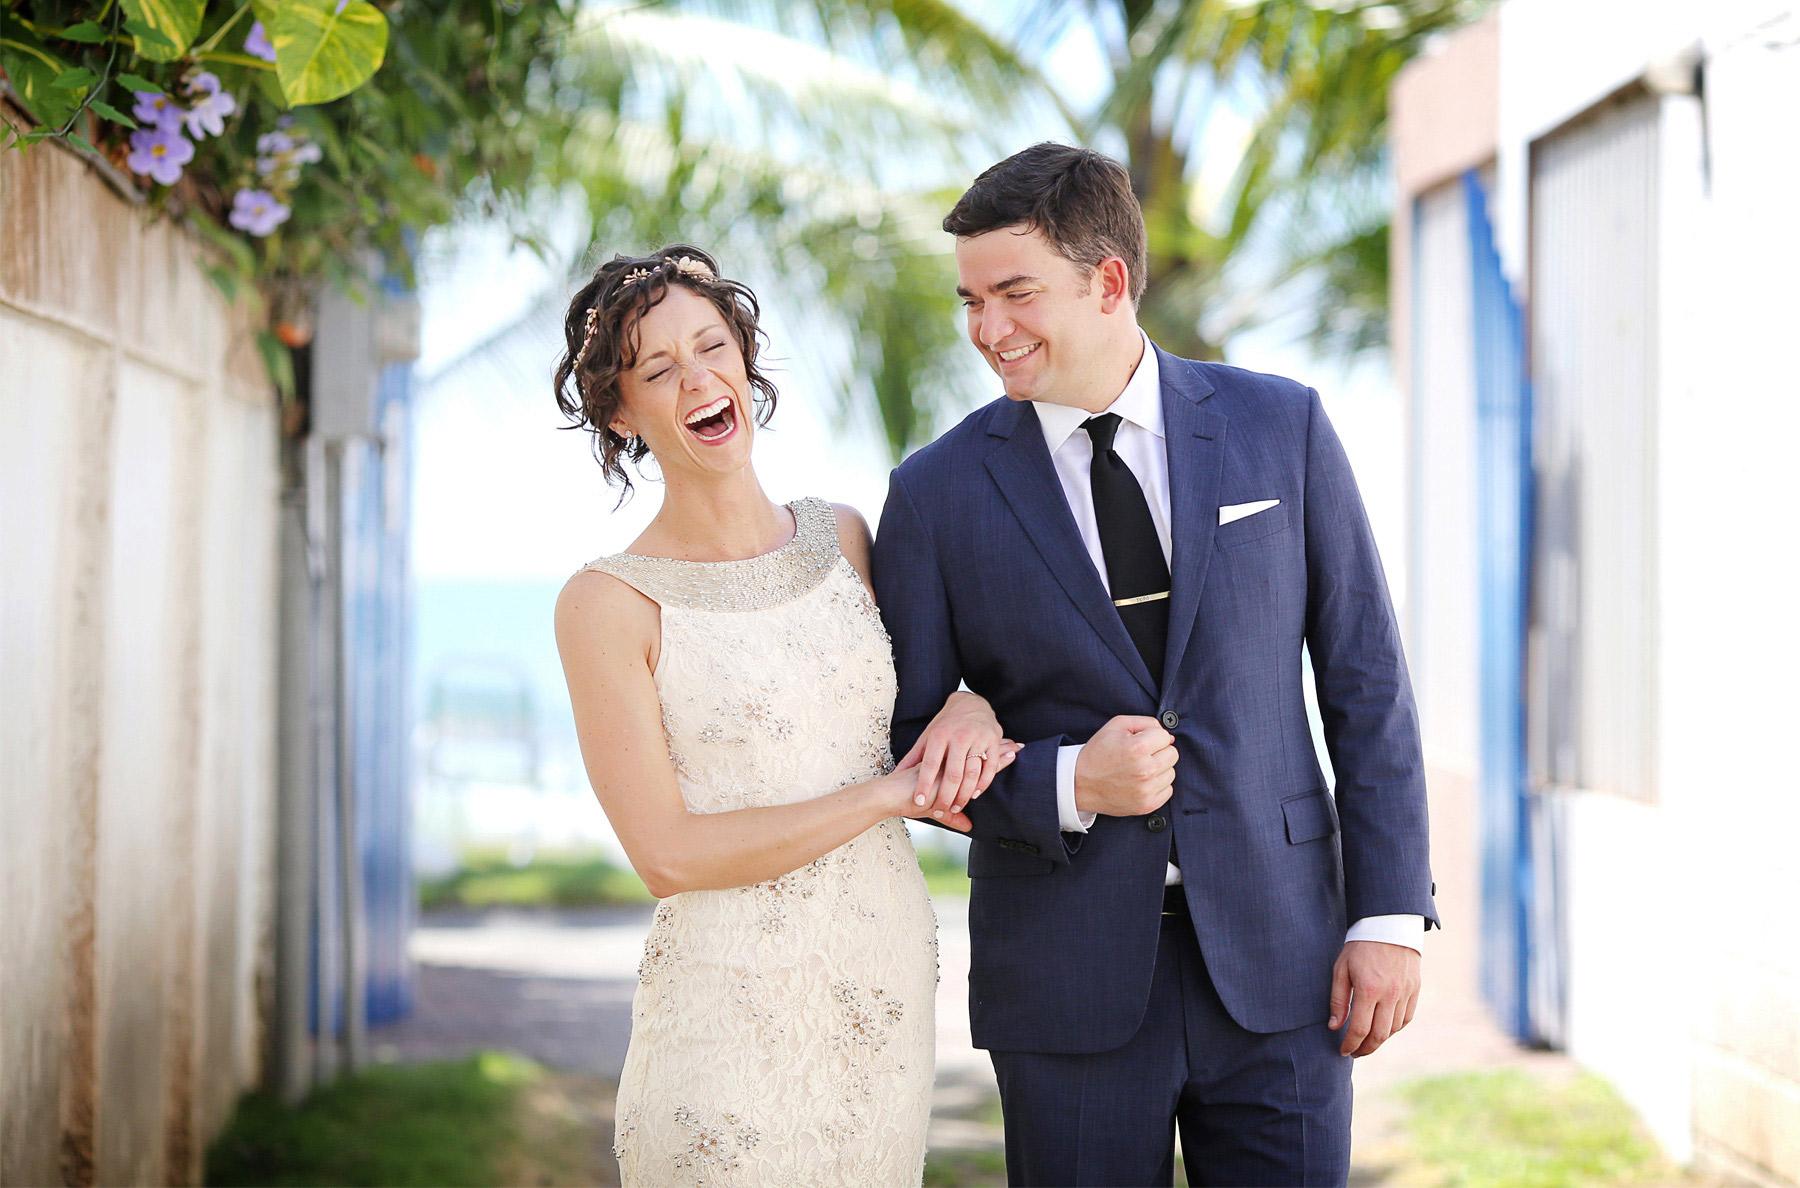 07-Costa-Rica-Wedding-Photography-by-Vick-Photography-Jaco-Tropical-Beach-Villa-Caletas-Resort-Alli-and-Duncan.jpg